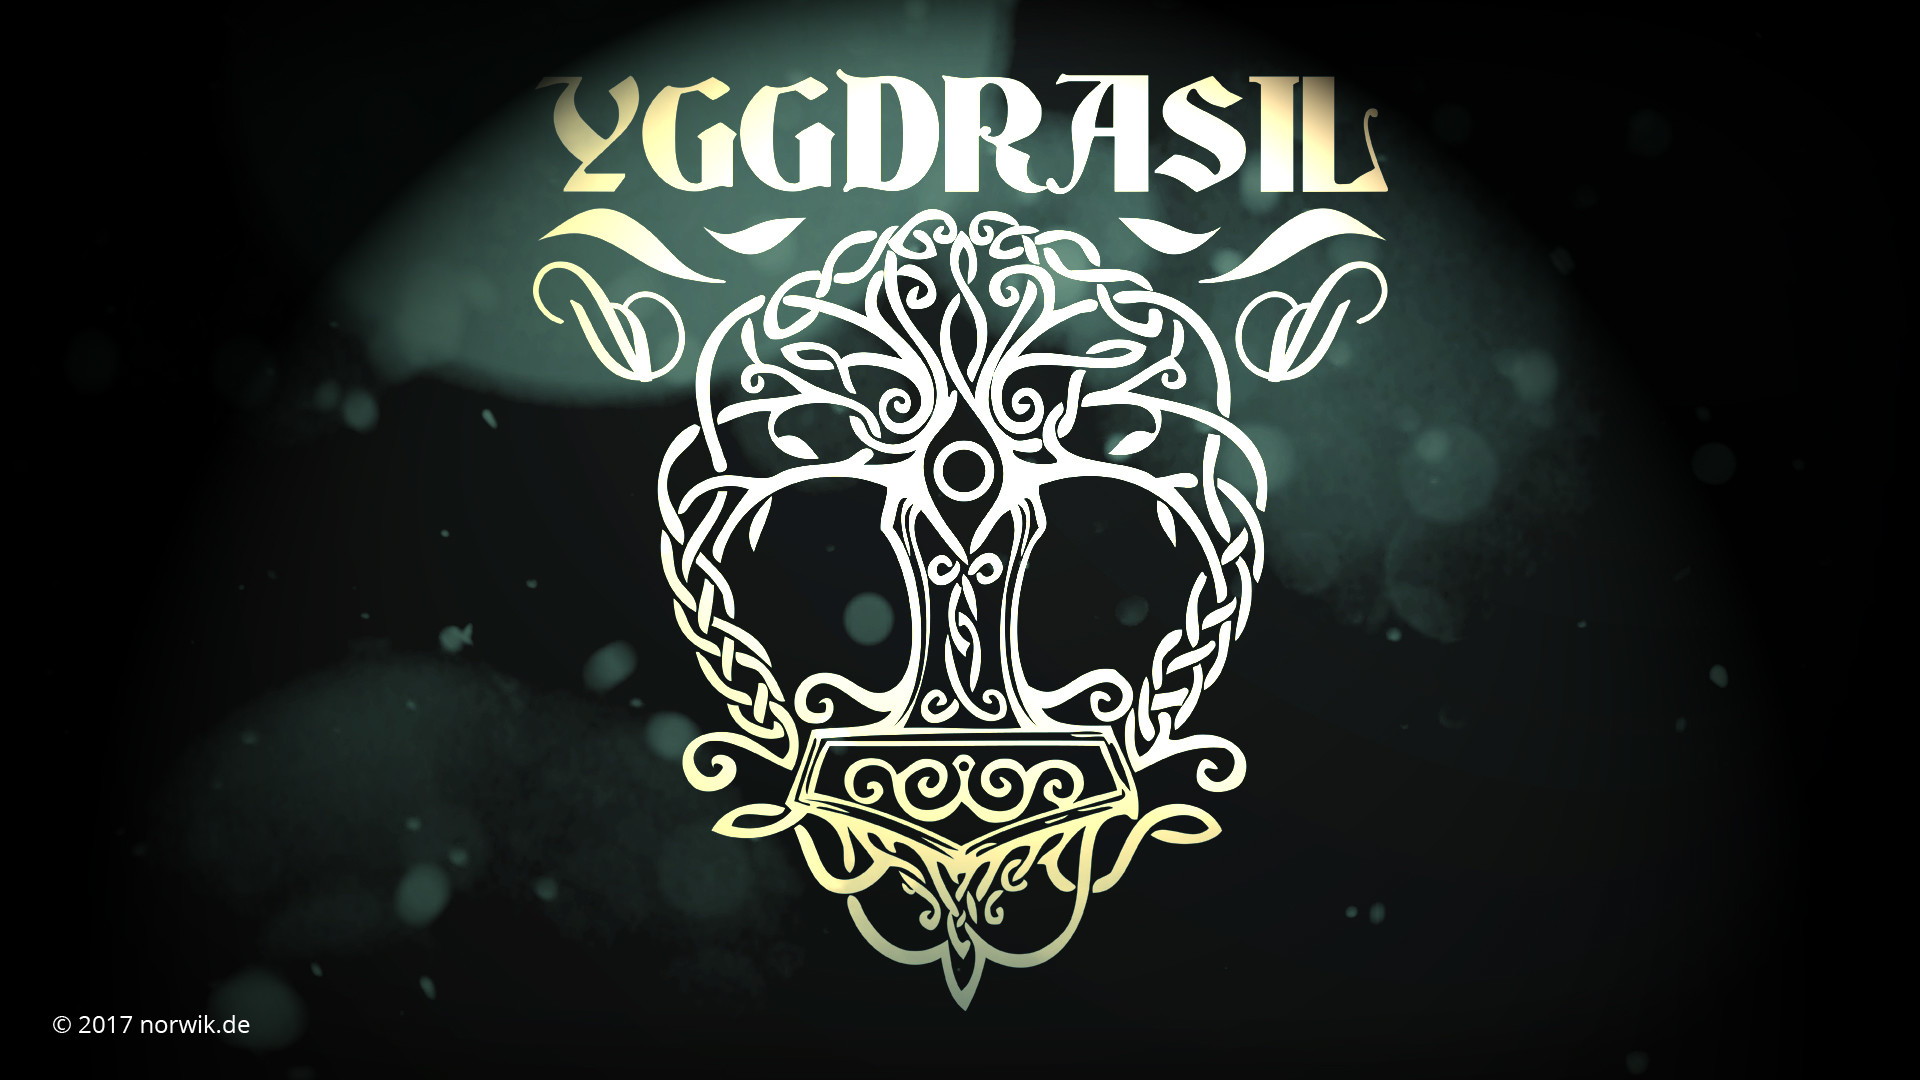 Yggdrasil Wallpaper (65+ images)